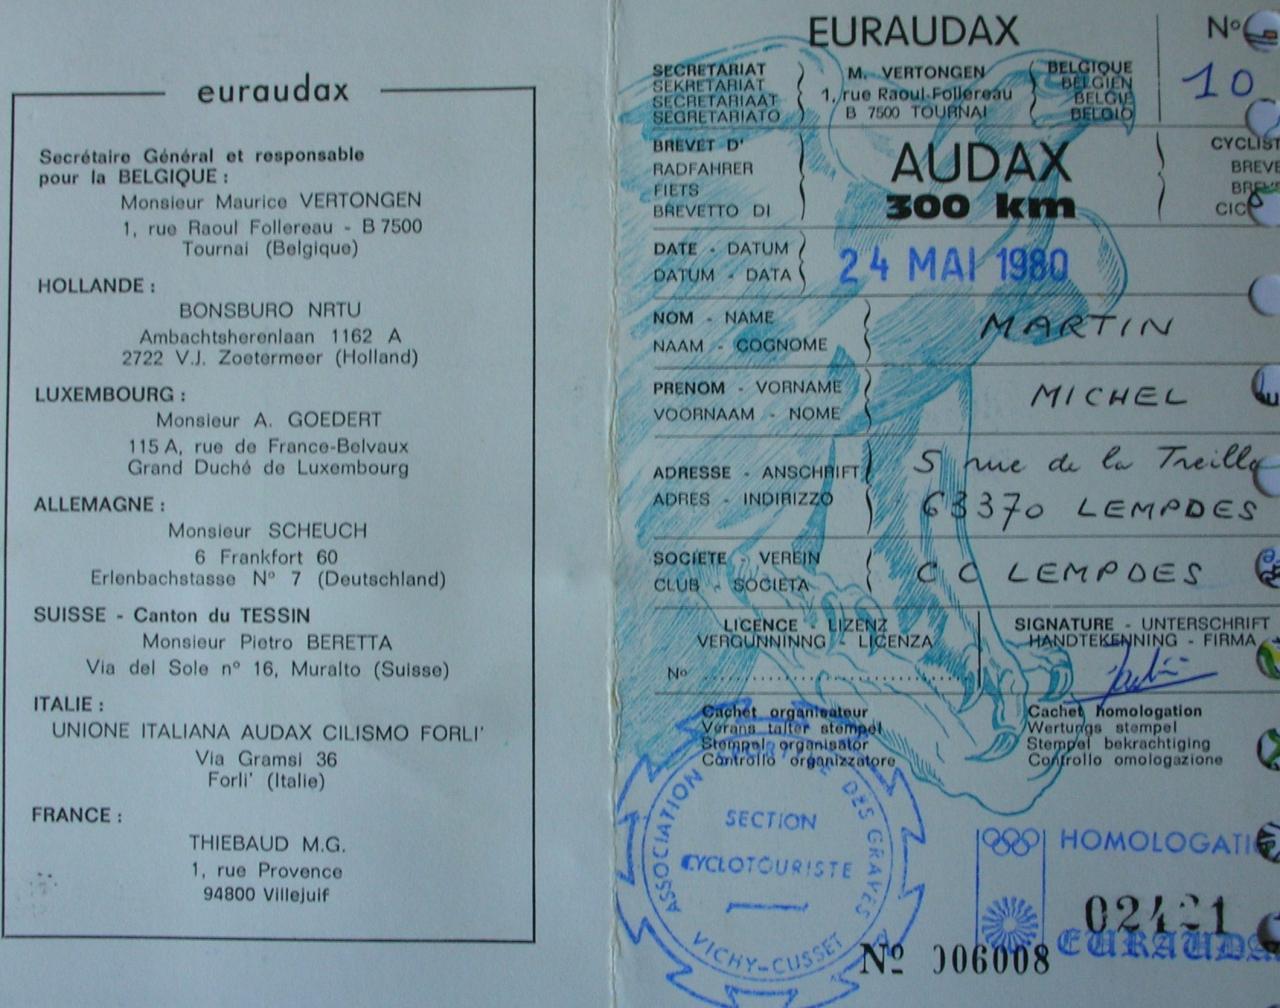 1980-brevet-audax-de-300-kms-du-24-mai-1.jpg